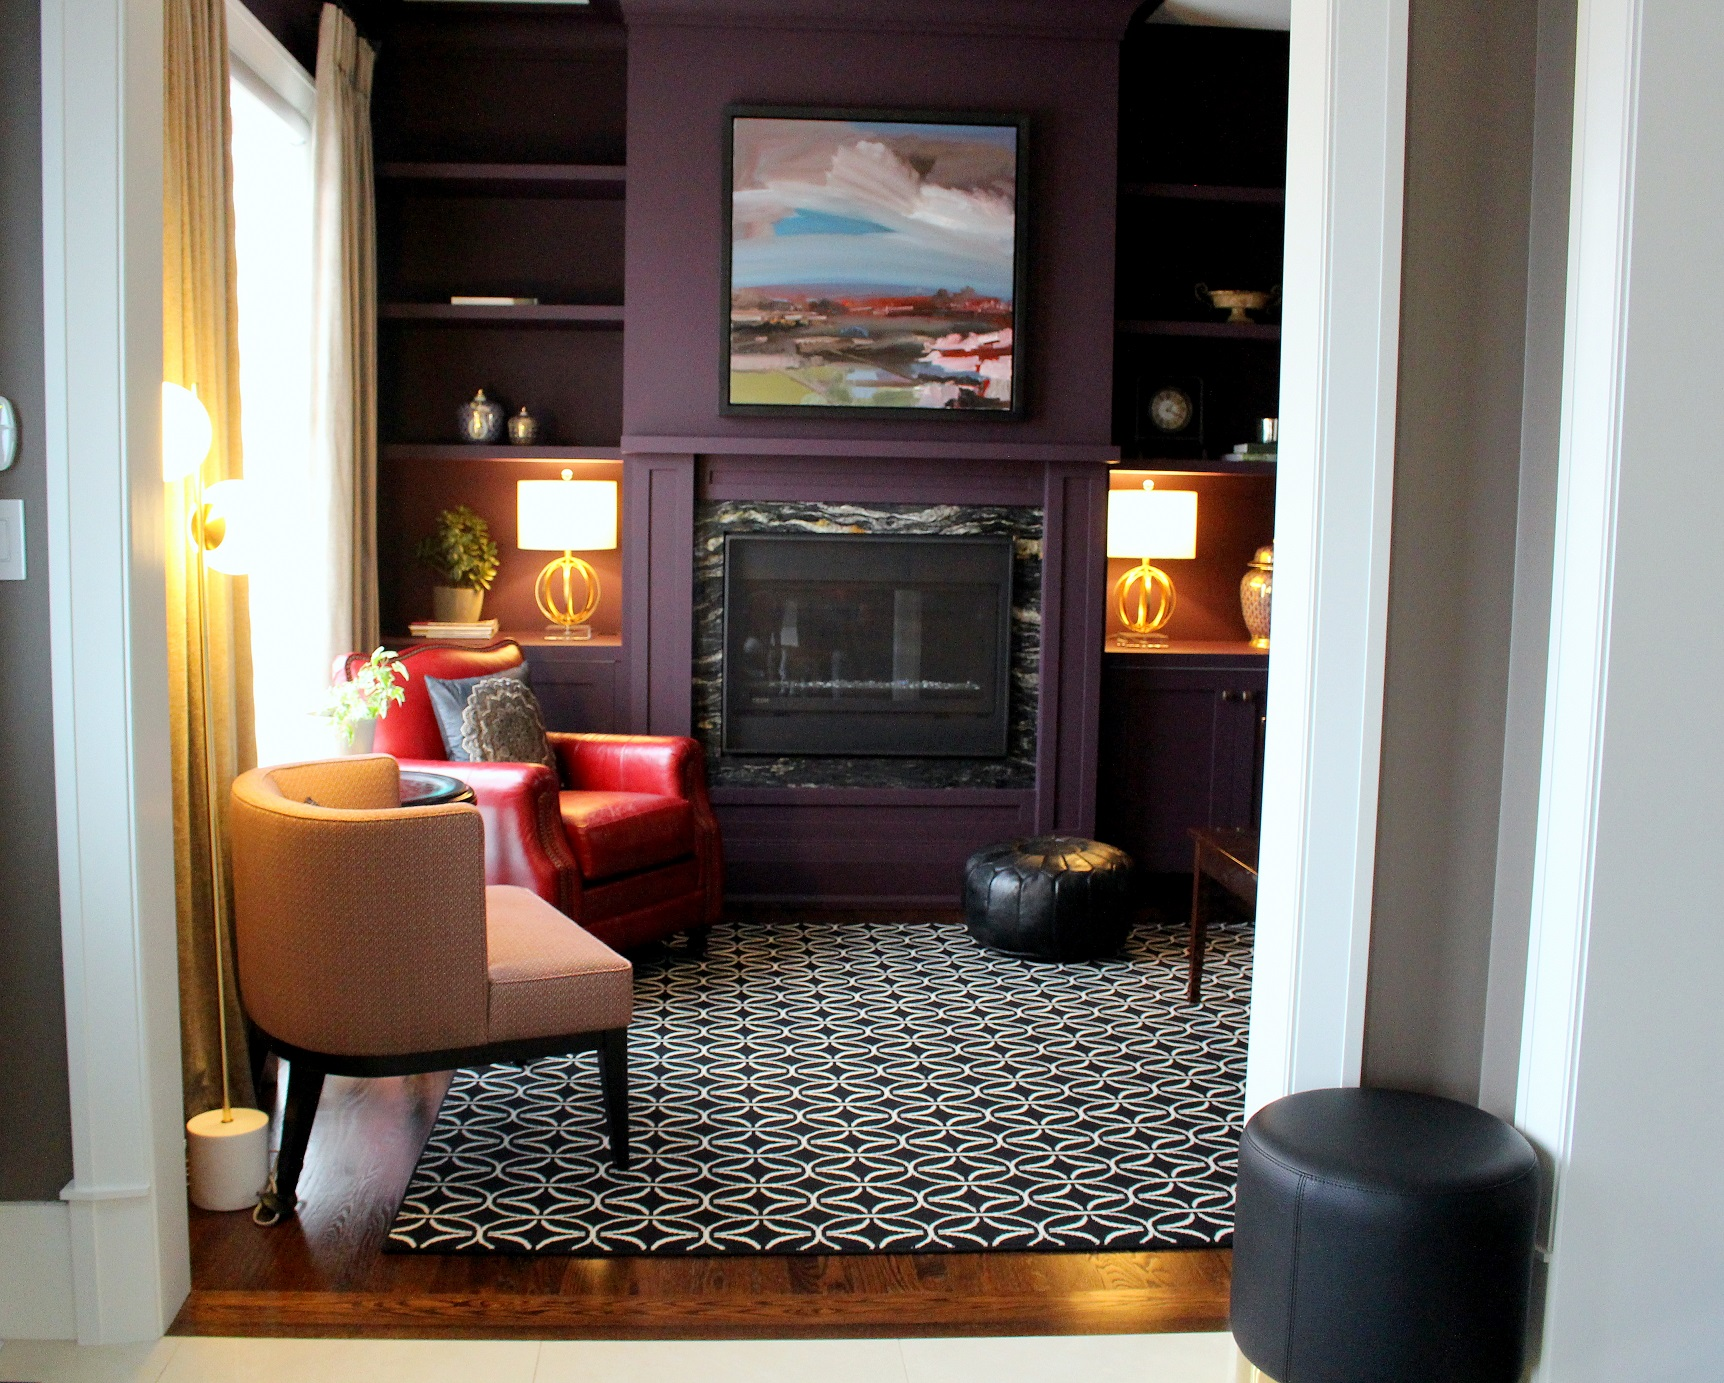 living room - cropped 1.JPG